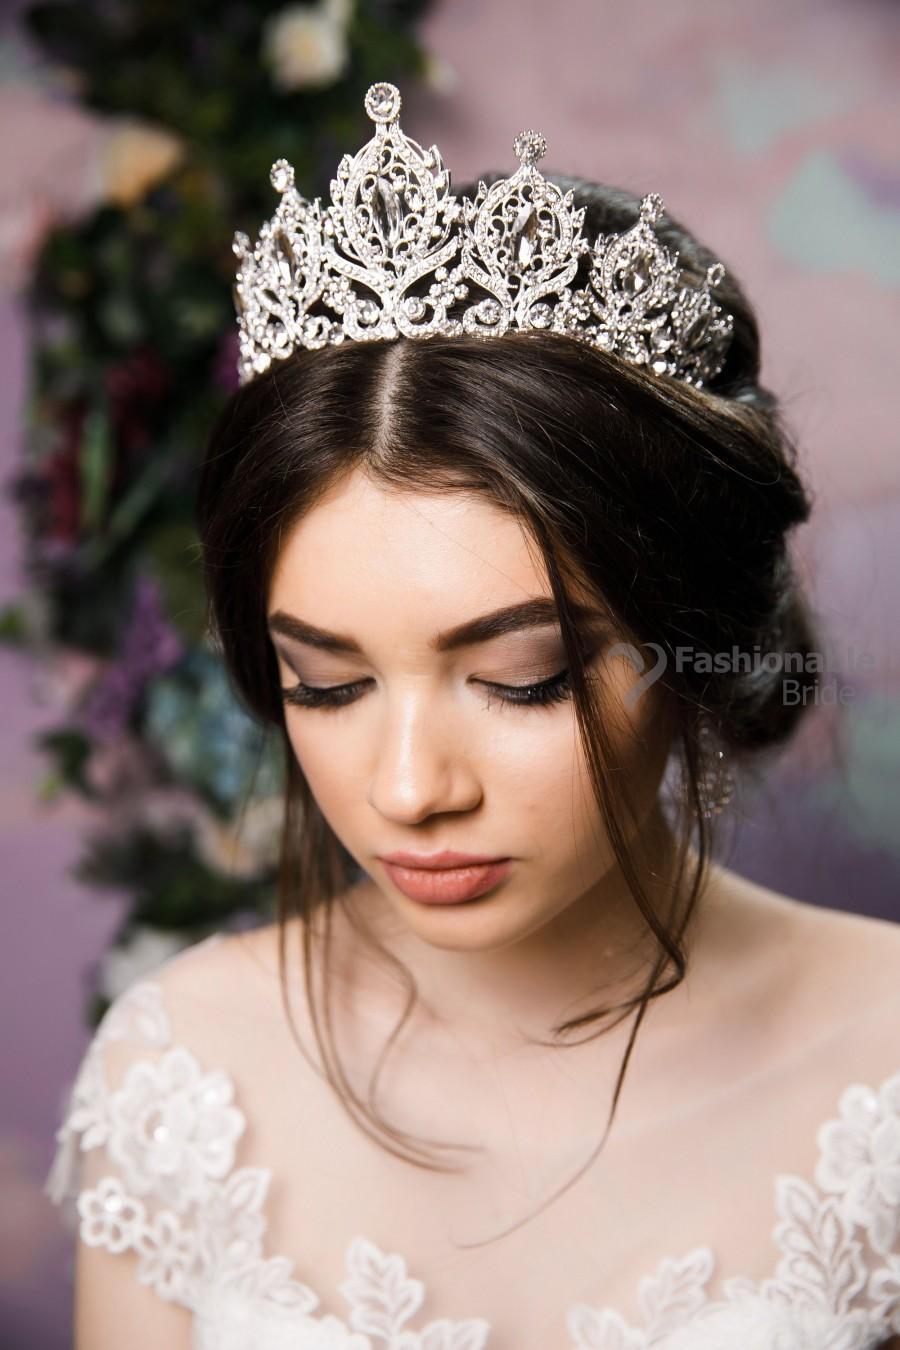 Свадьба - Tiara,Bridal Tiara,Wedding Tiara,Gold Tiara,Wedding Tiara,Silver Tiara.